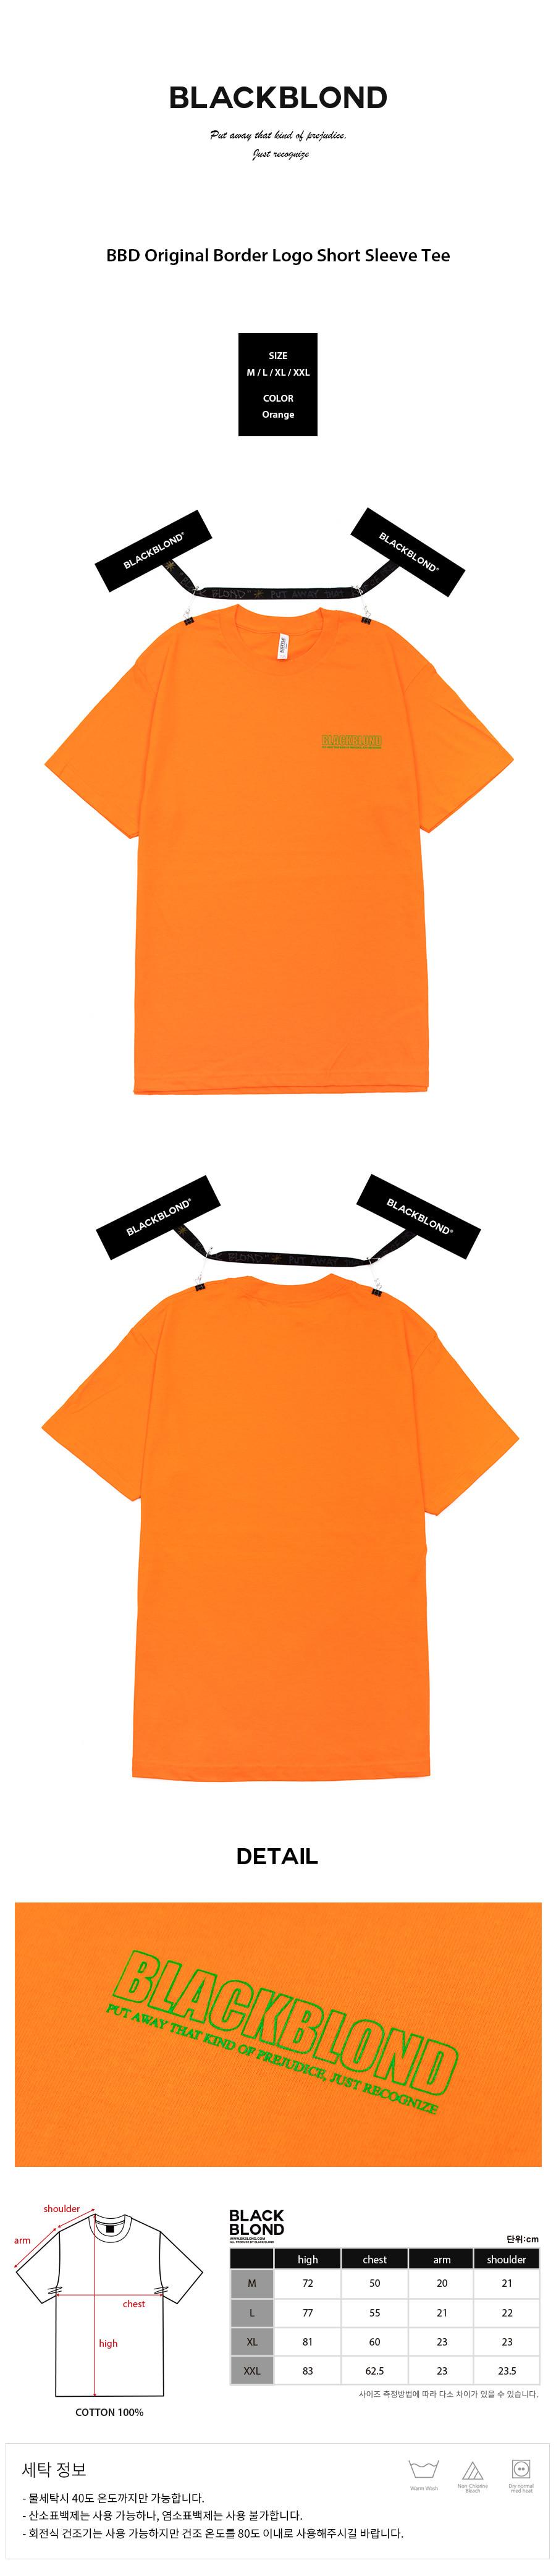 BLACKBLOND - BBD Original Border Logo Short Sleeve Tee (Orange)